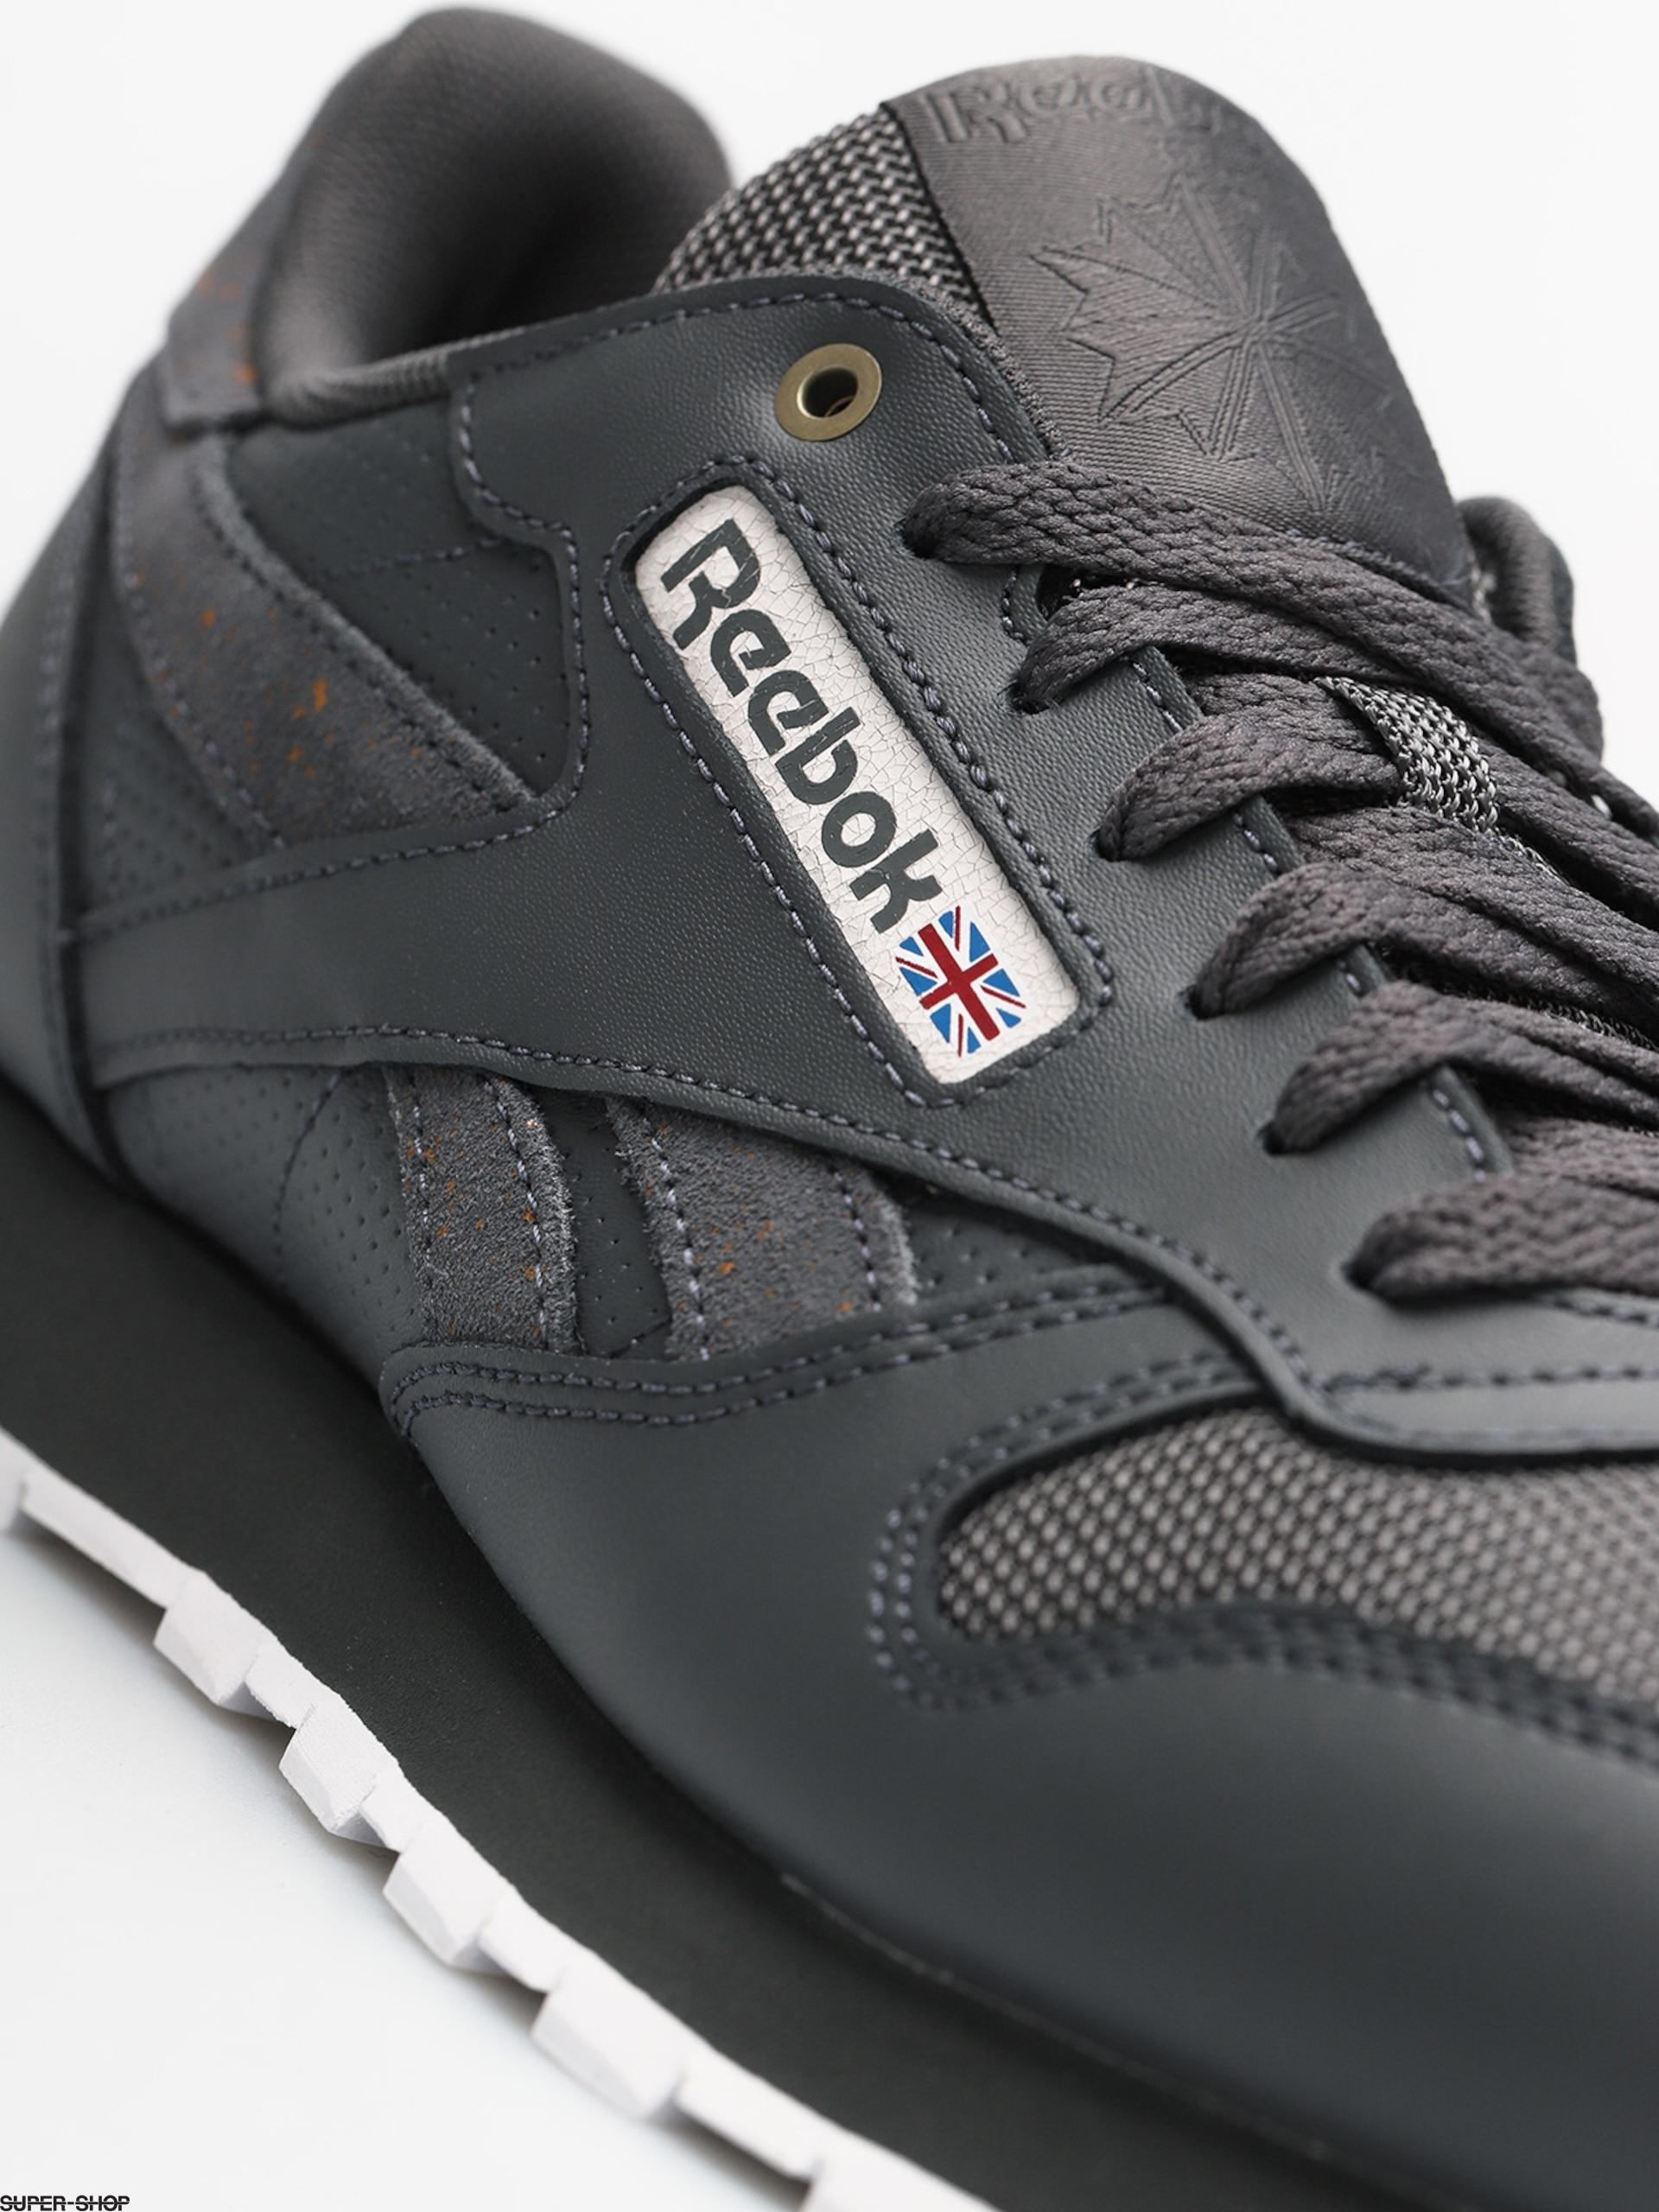 Reebok Shoes Cl Leather Mu (mc stealthbananawhite)